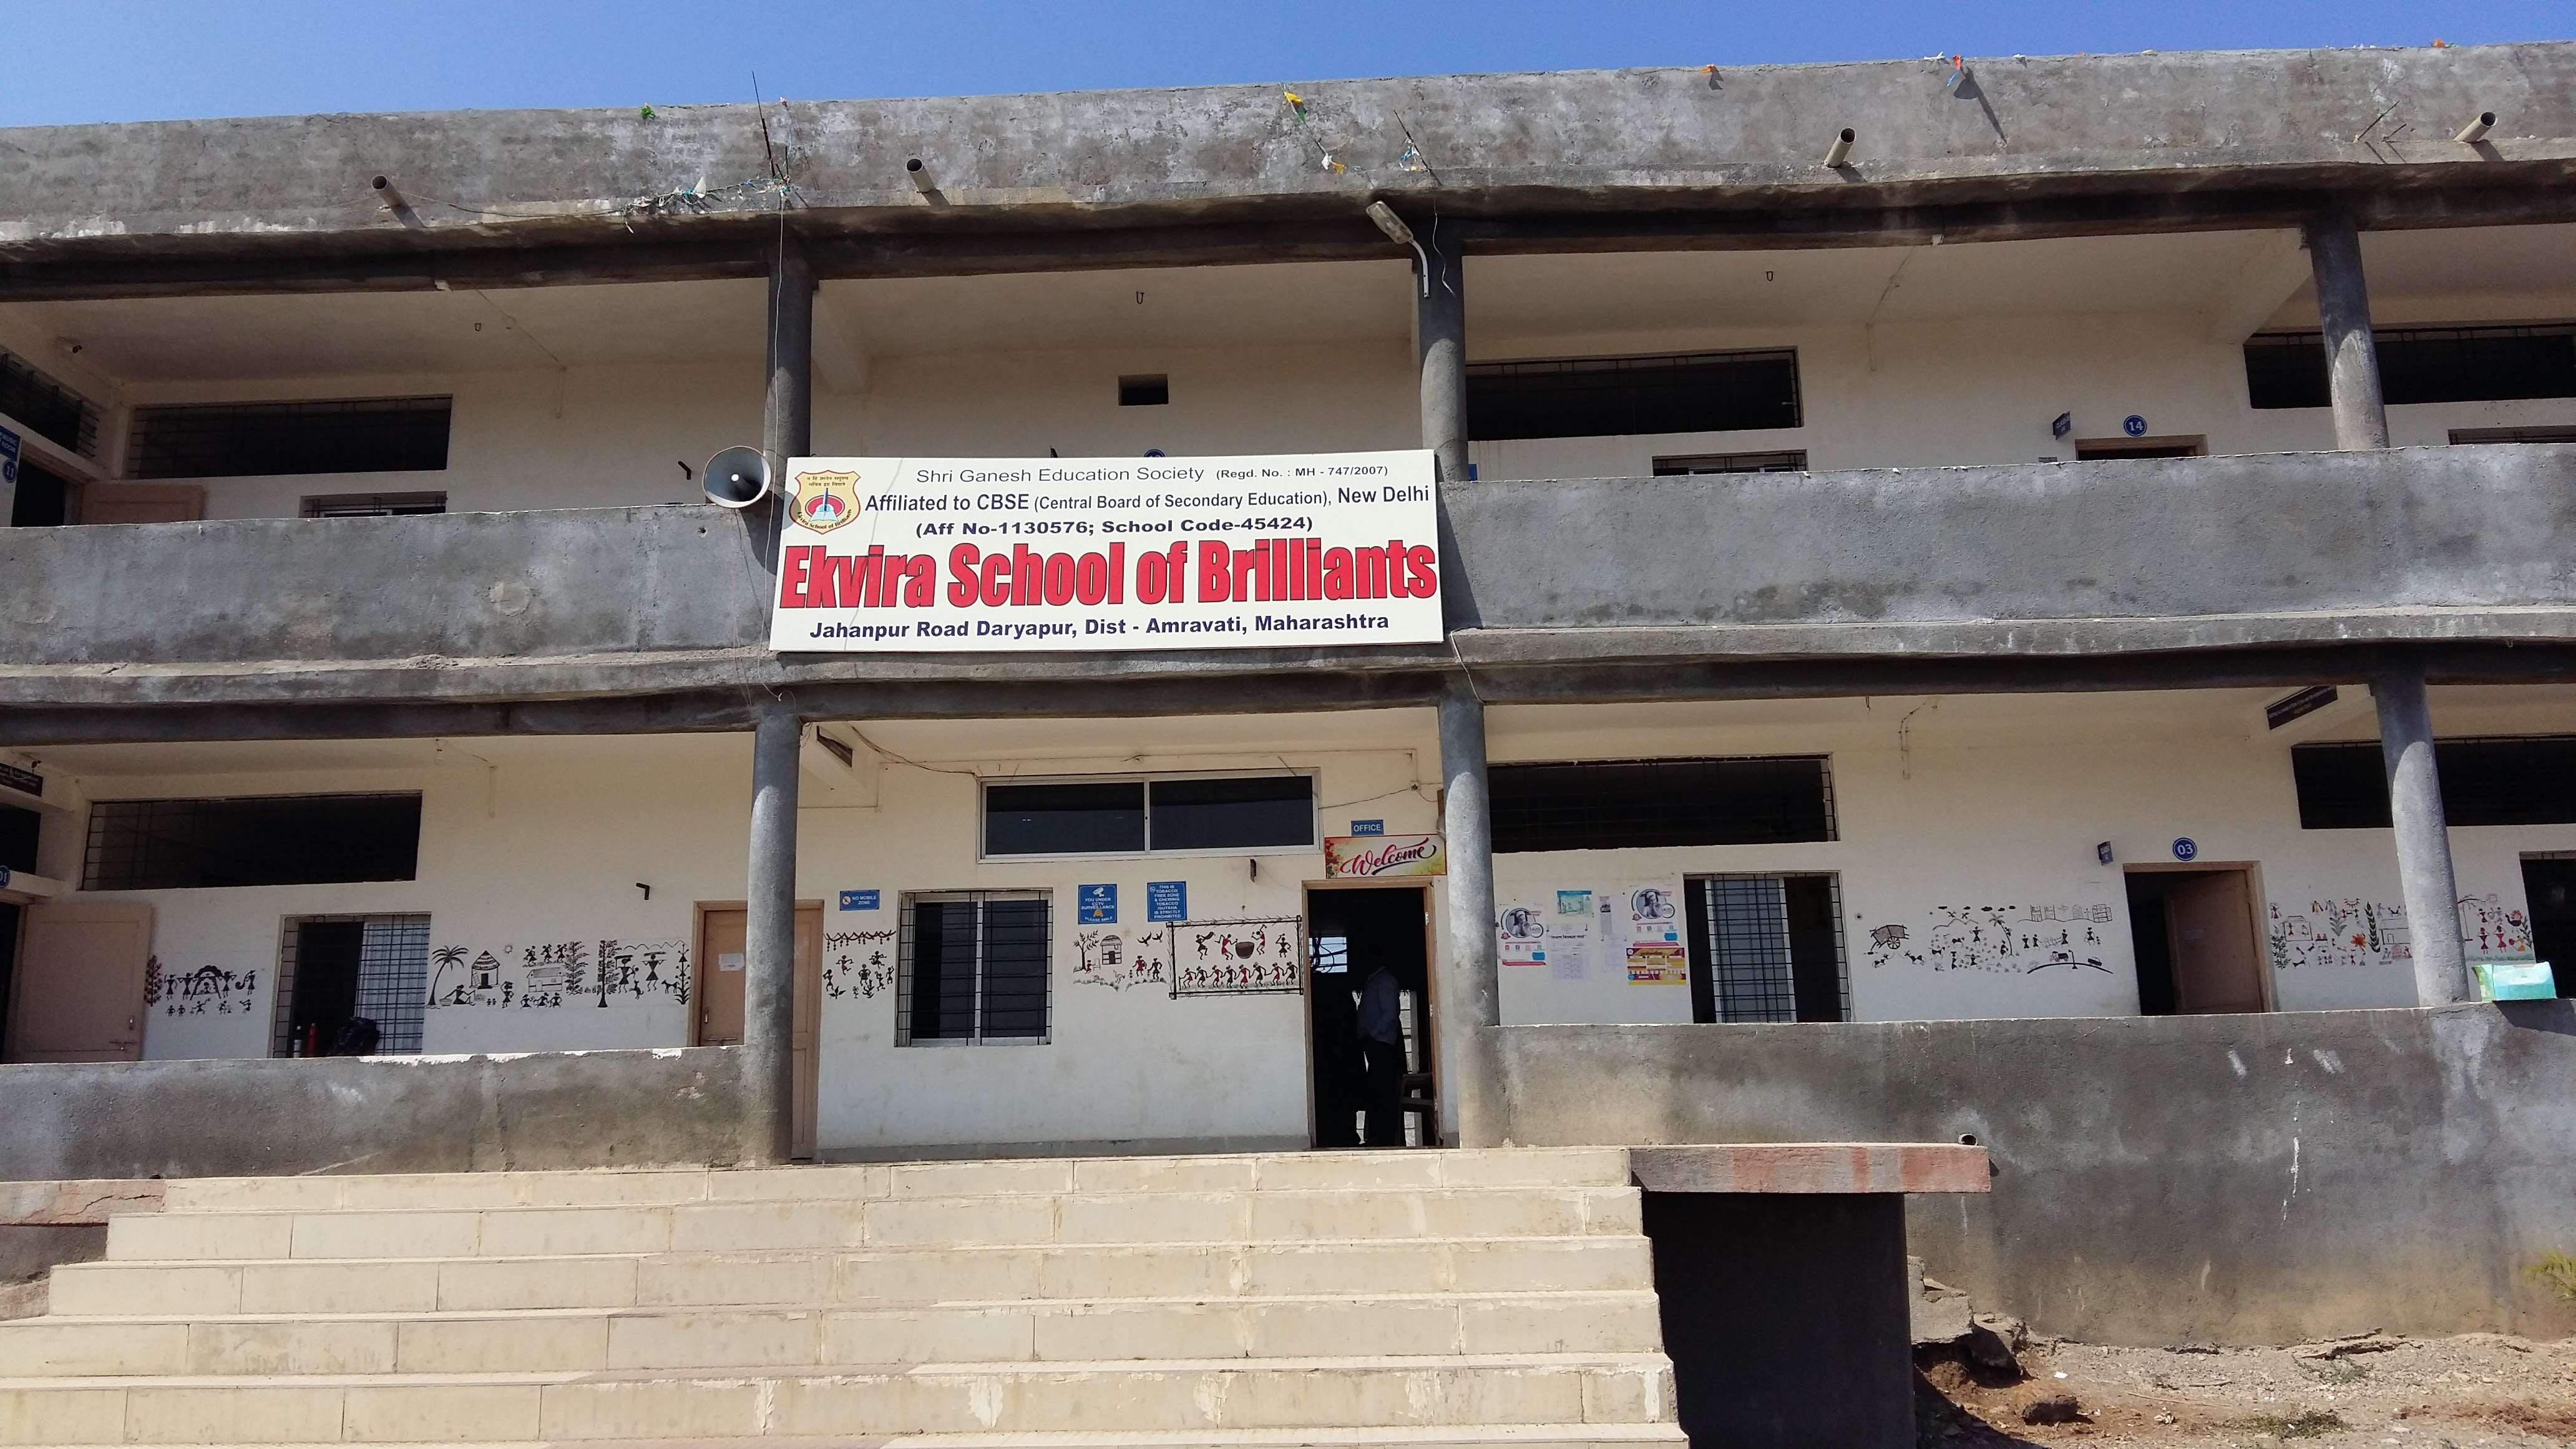 EKVIRA SCHOOL OF BRILLIANTS, AMRAVATI, MAHARASHTRA--1130576